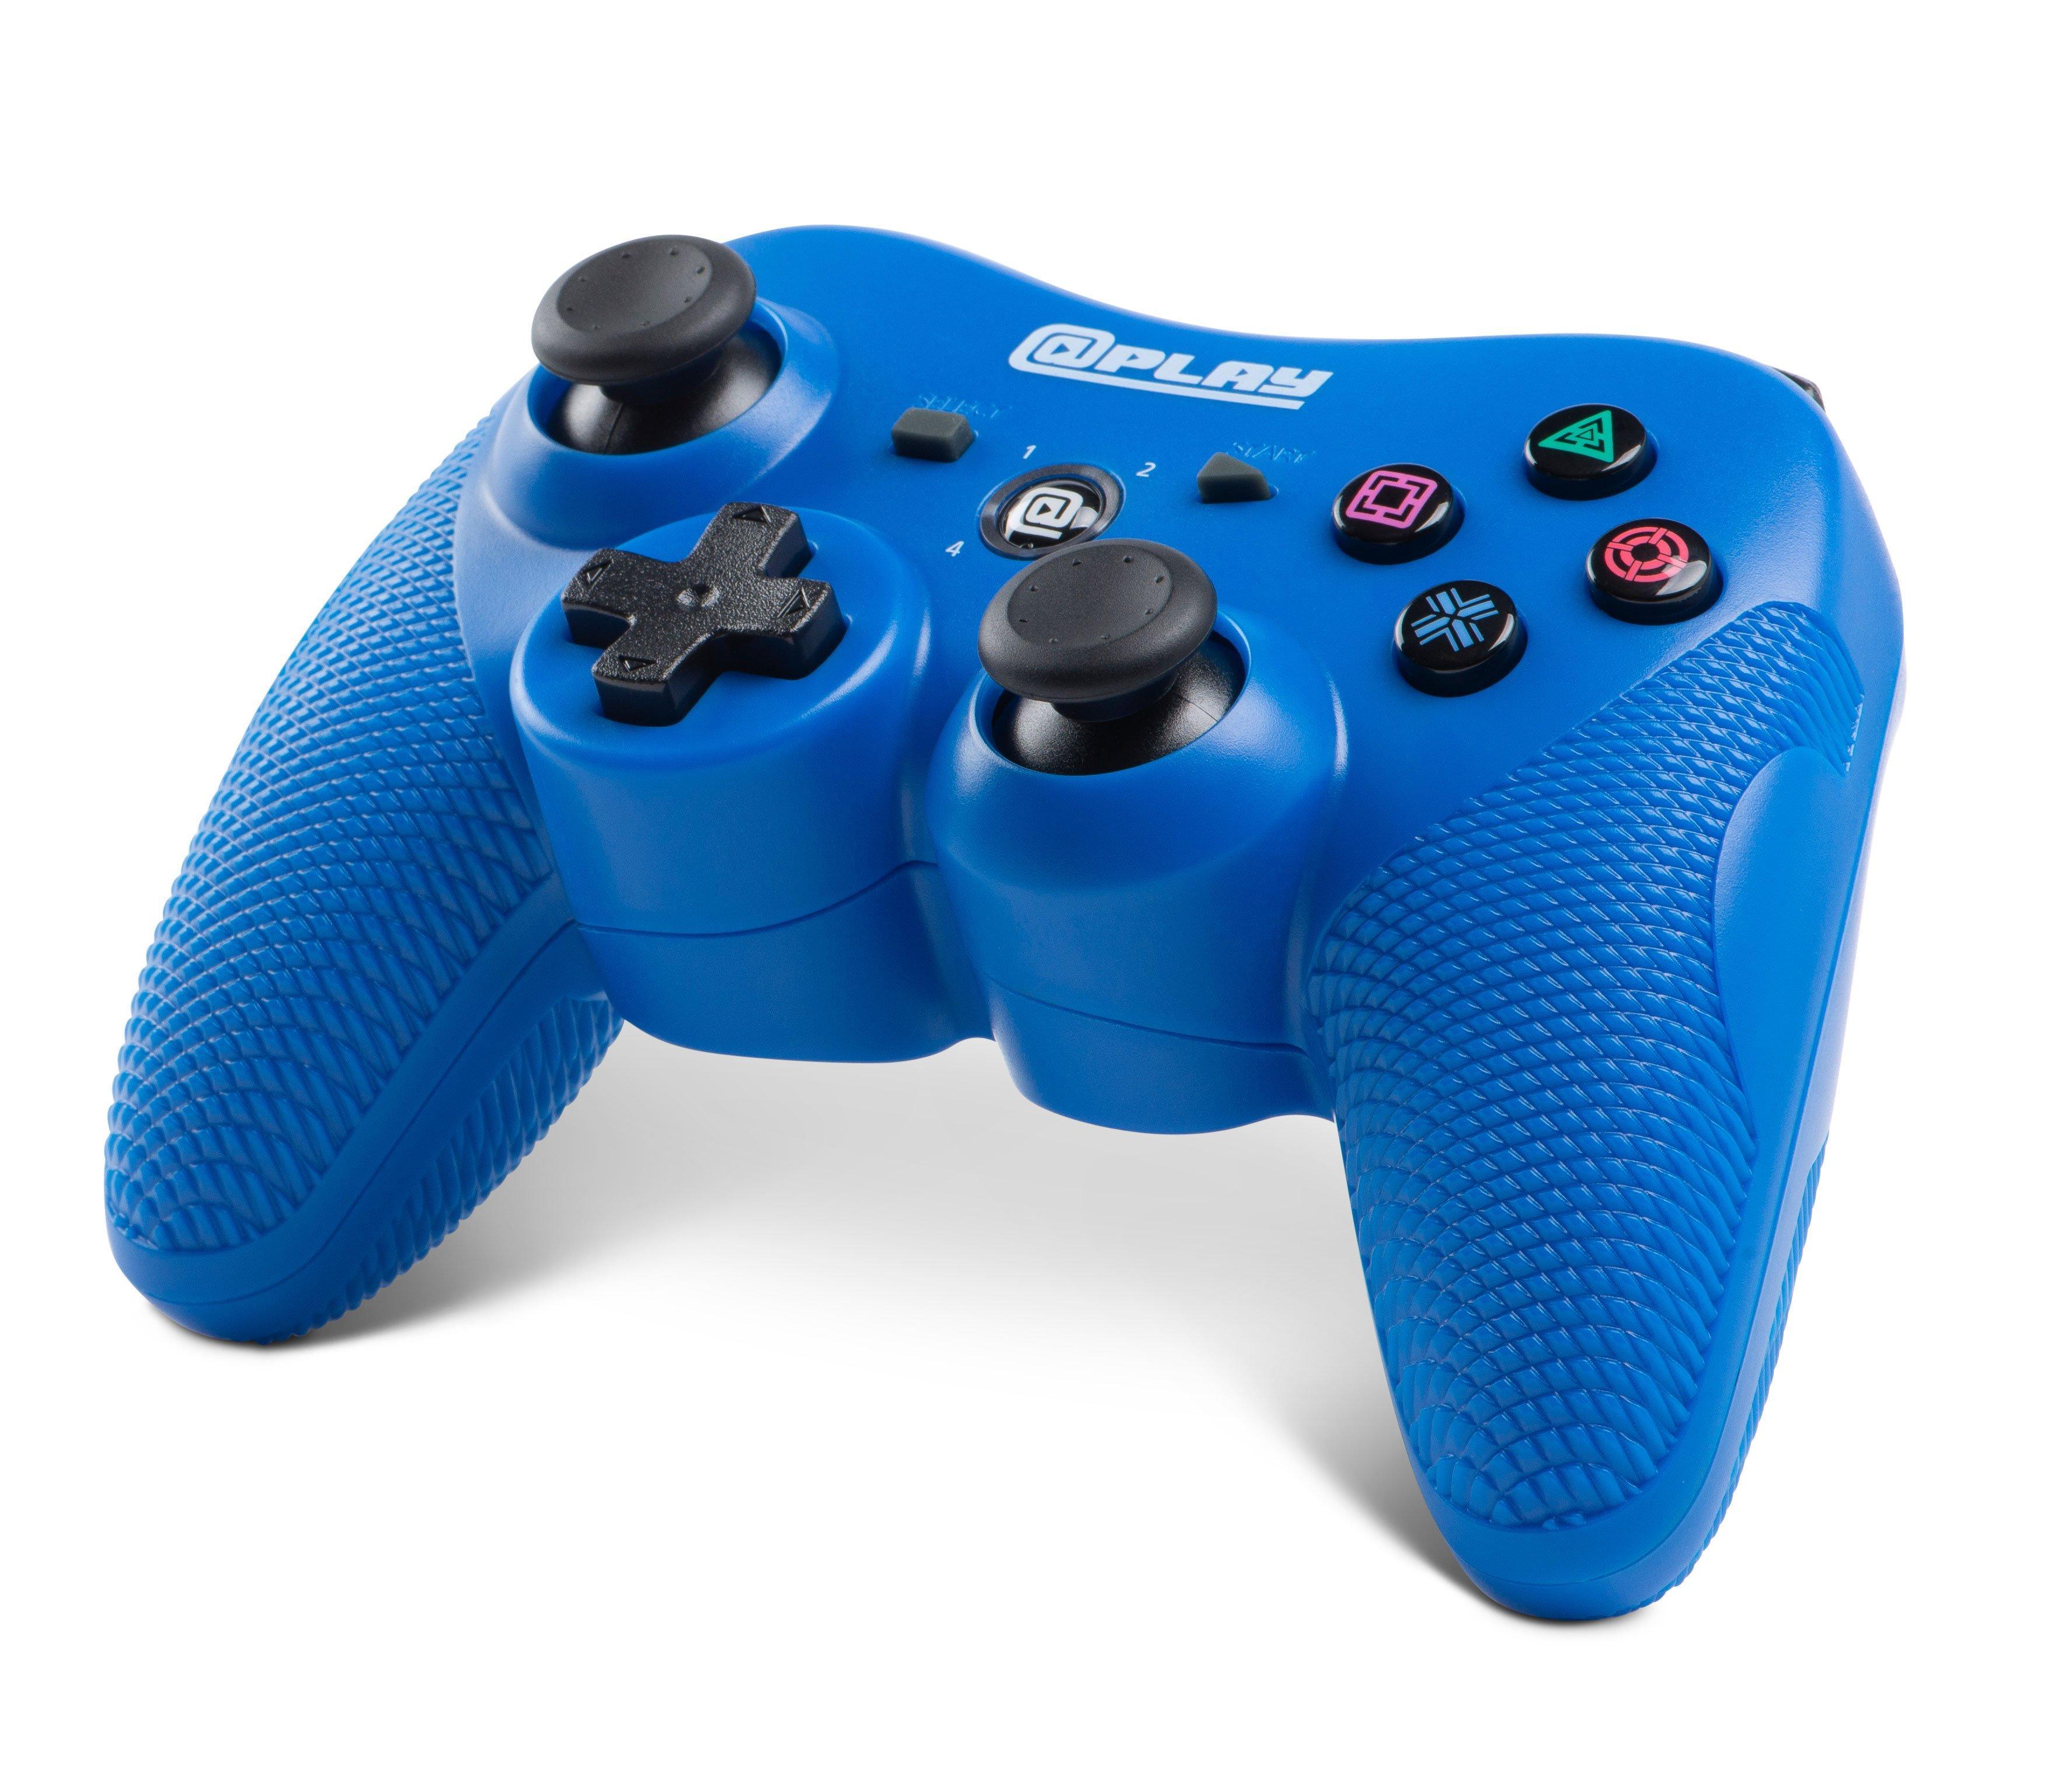 Ps3 Wireless Controller Blue Gamestop